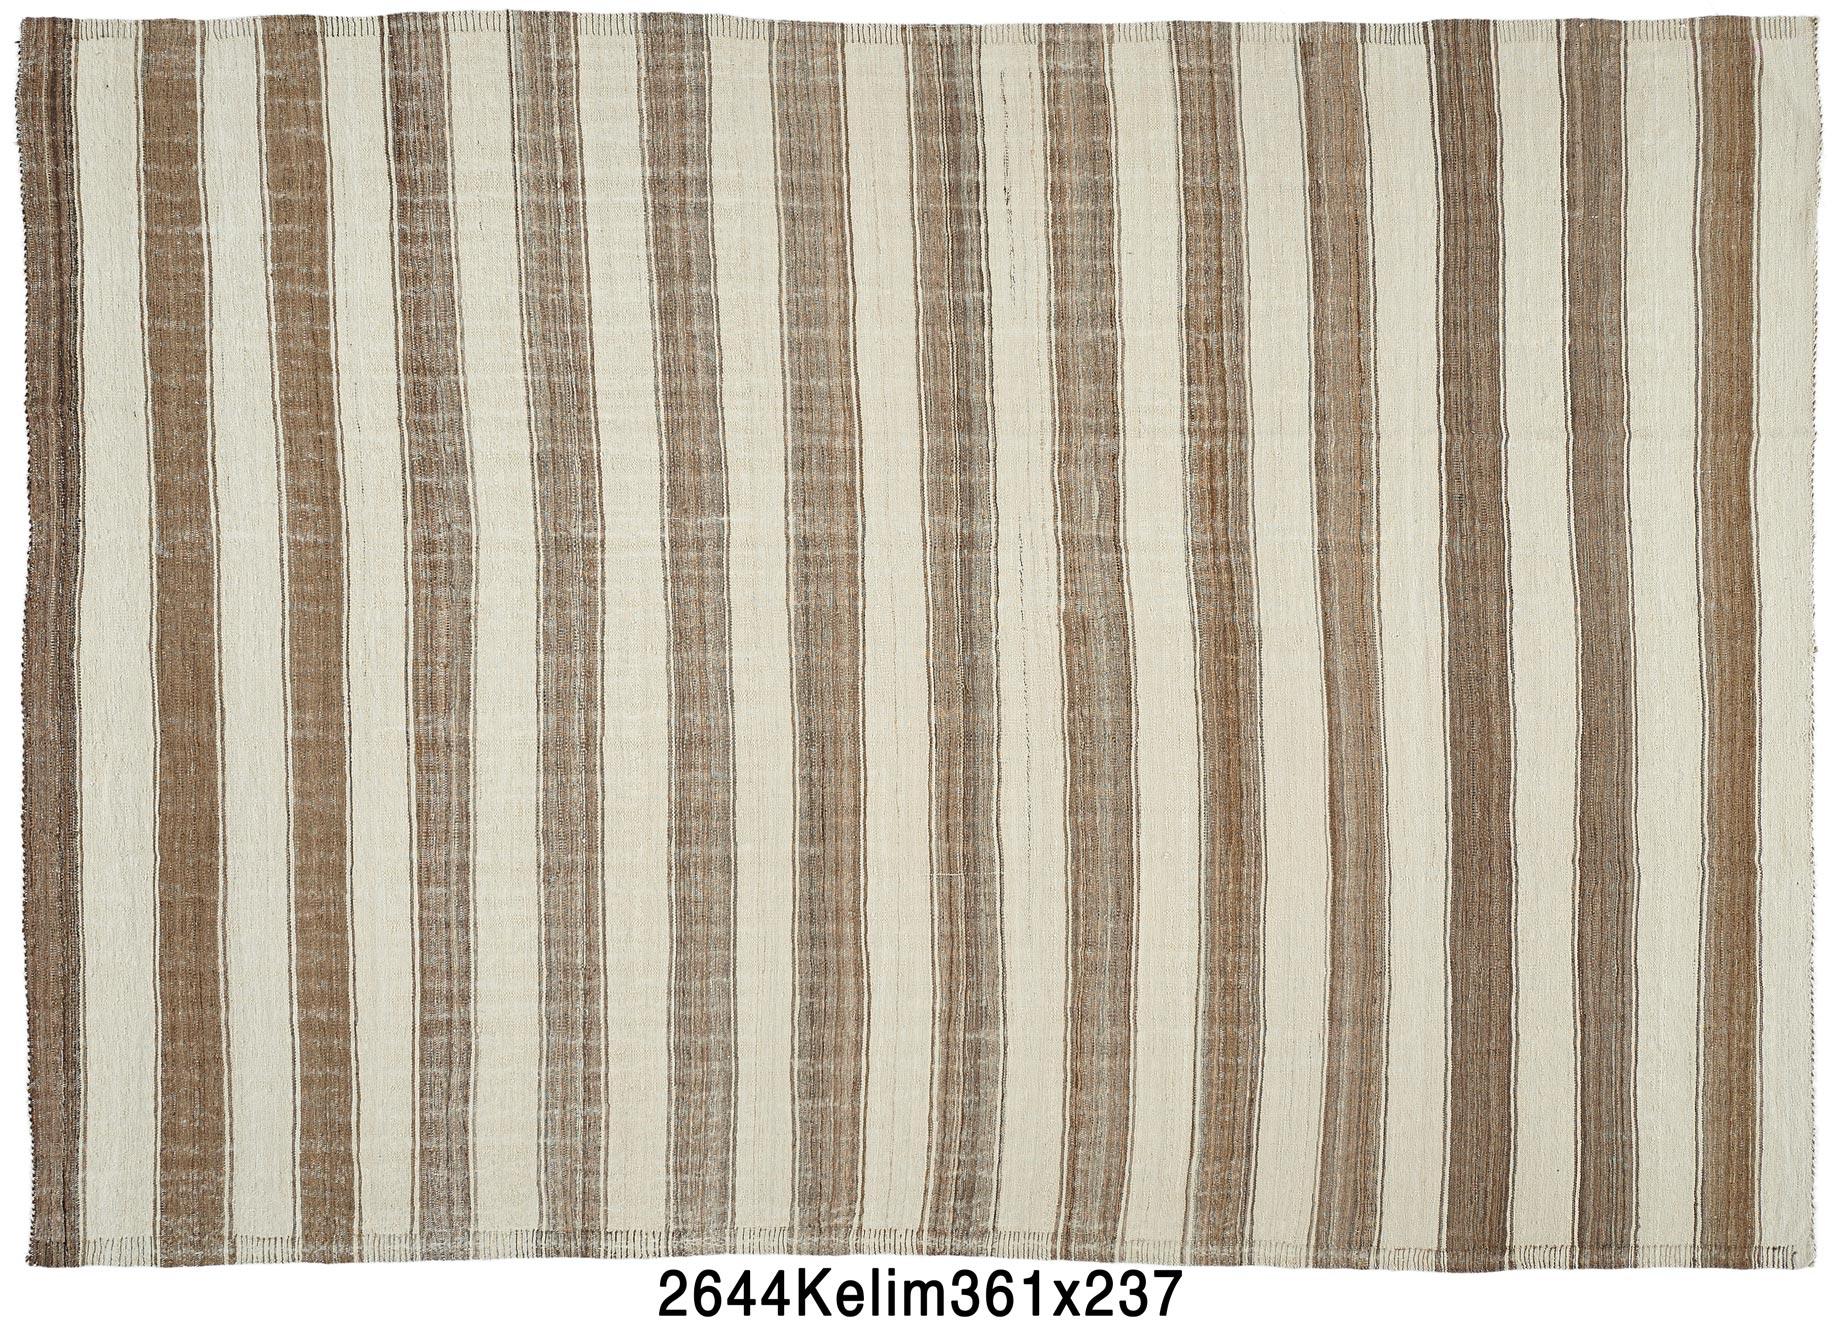 2644 kelim 361x237 ariana rugs. Black Bedroom Furniture Sets. Home Design Ideas